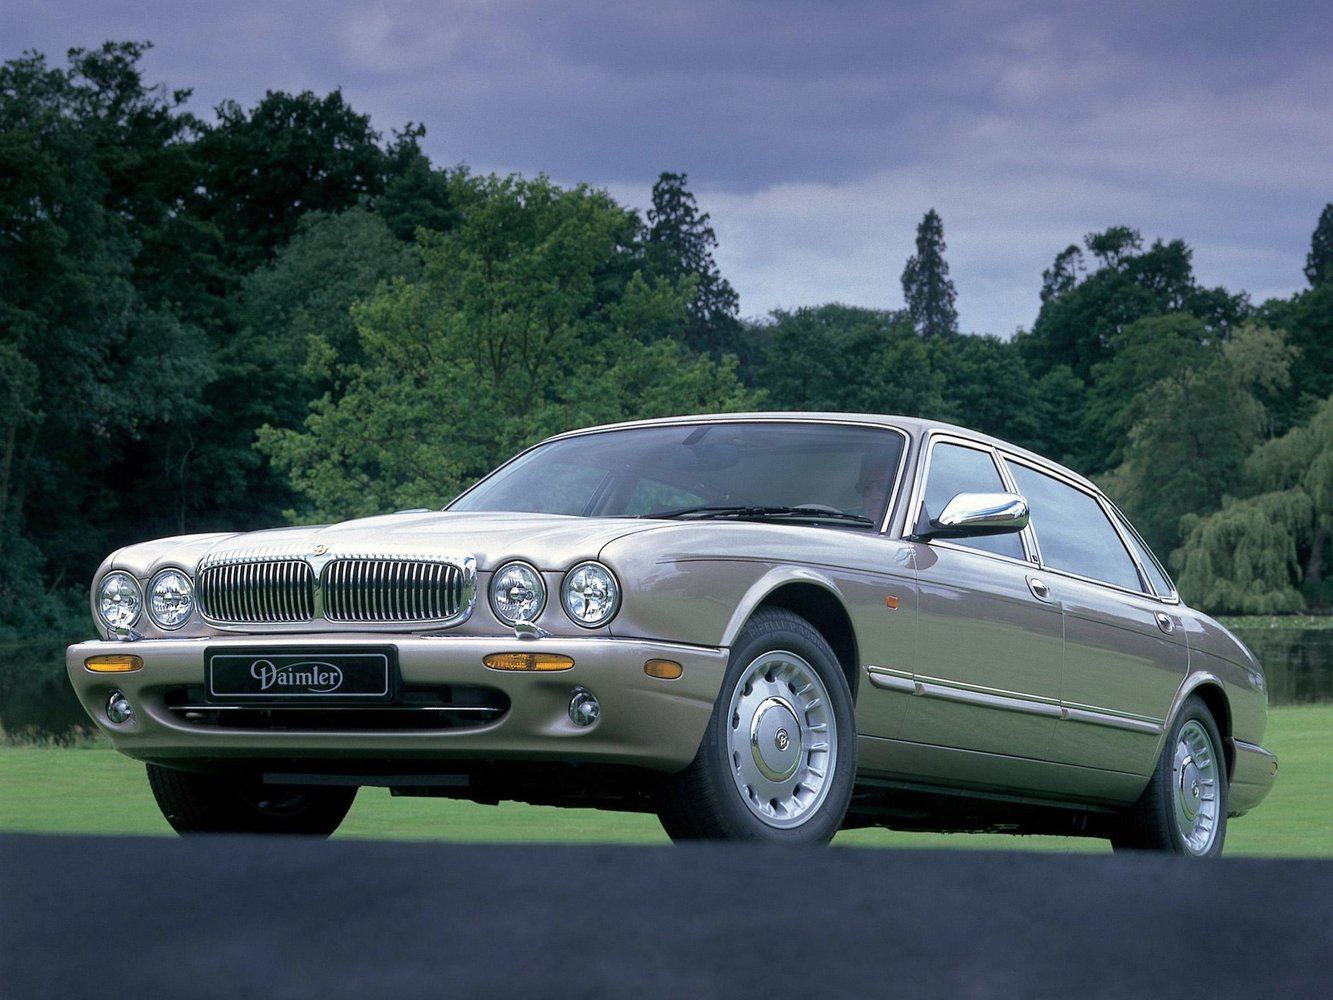 daimler Daimler X308